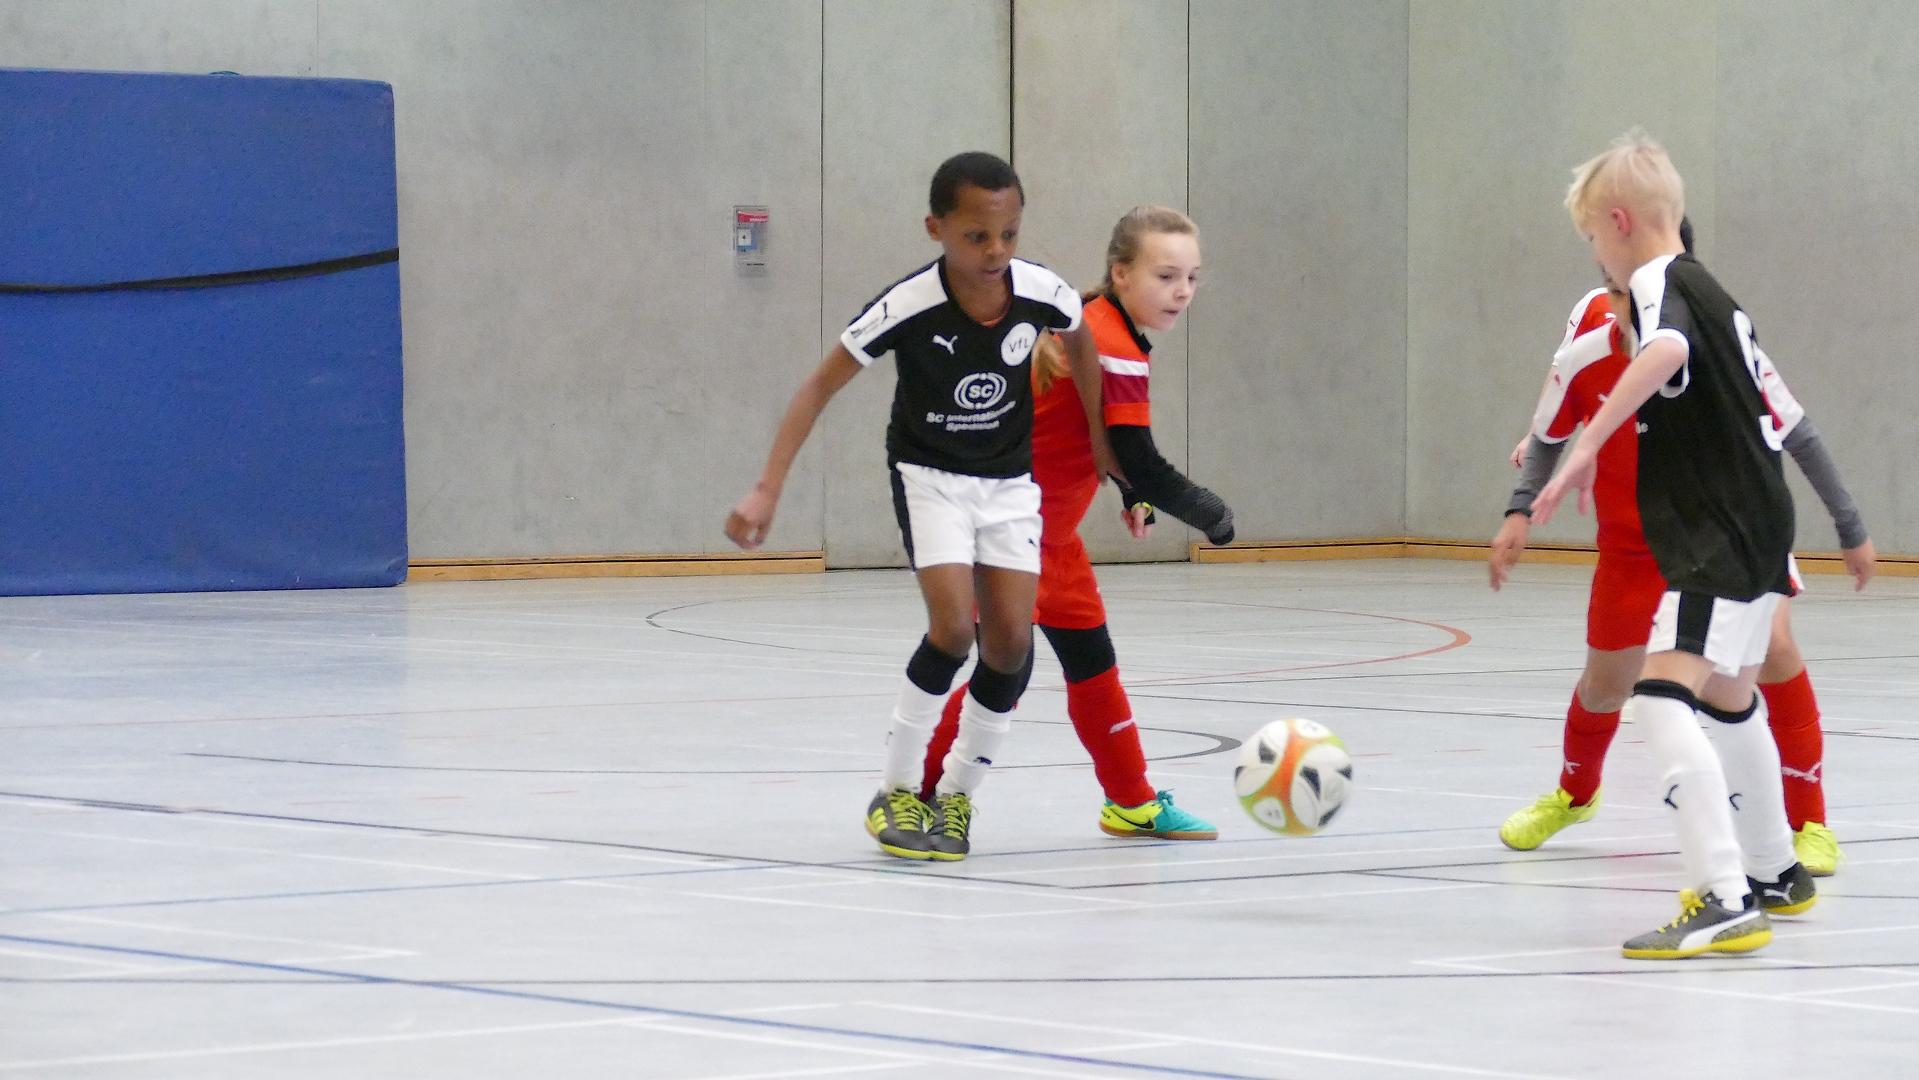 DJK Eintracht Dorstfeld / E1-Junioren Jahrgang 2009-2010